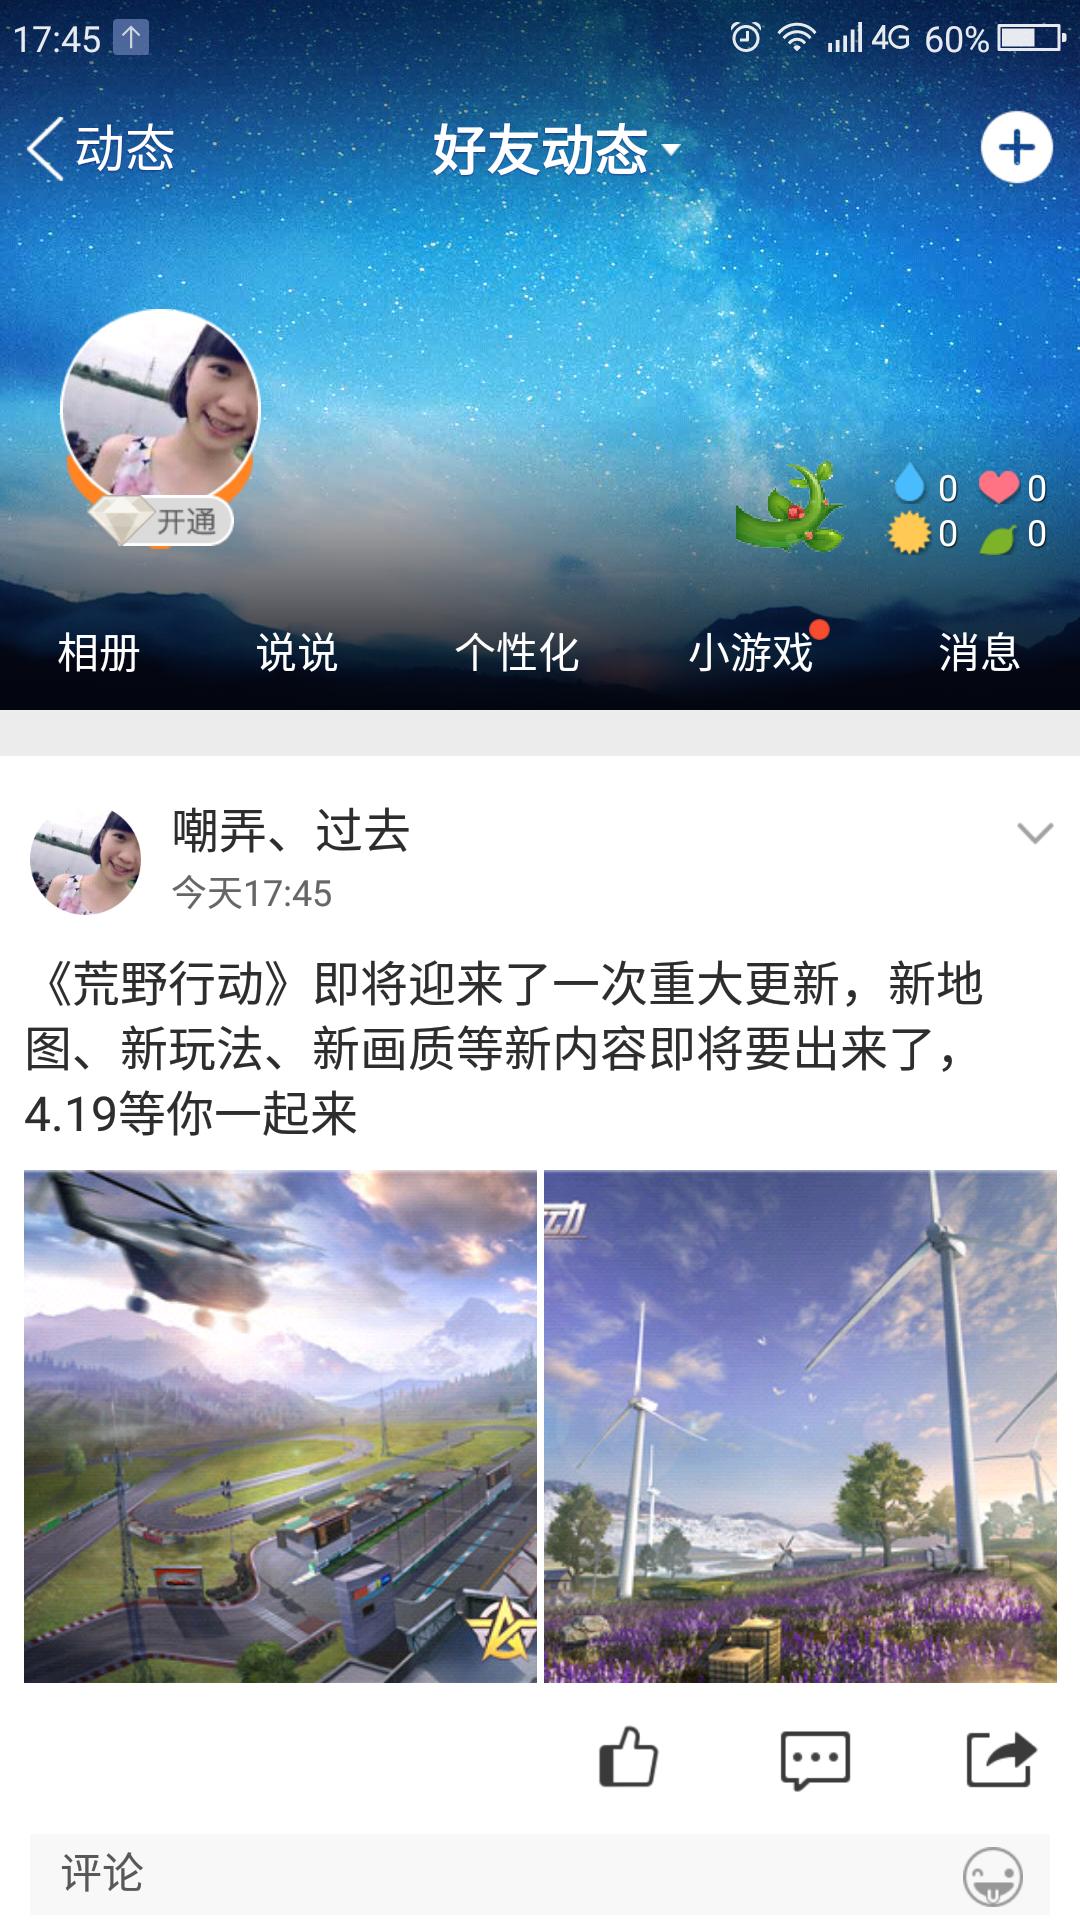 QQ图片20180418175644.png